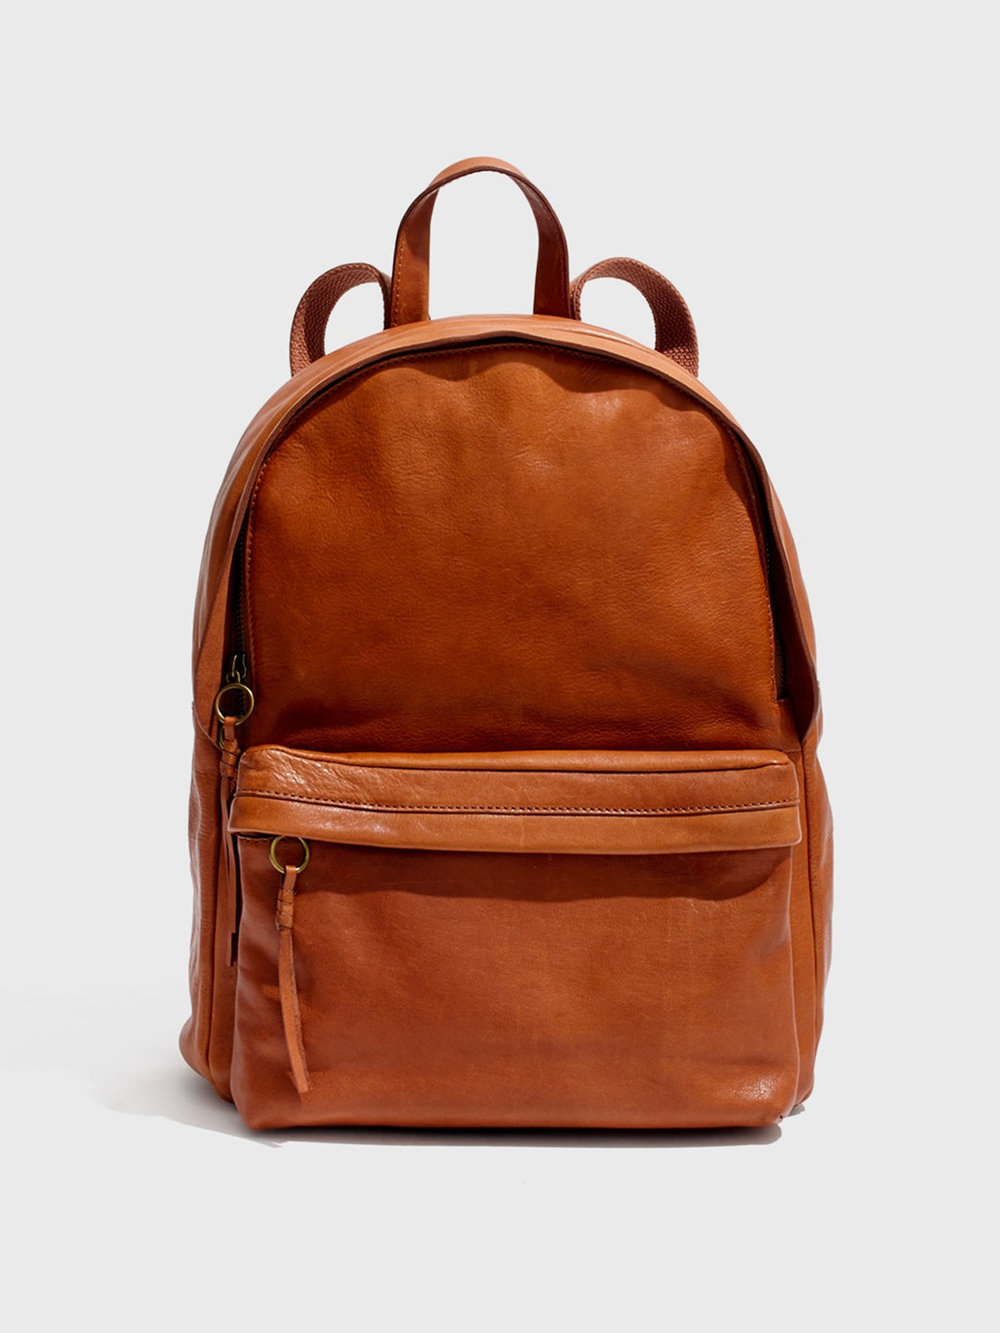 The Lorimer Backpack, $198